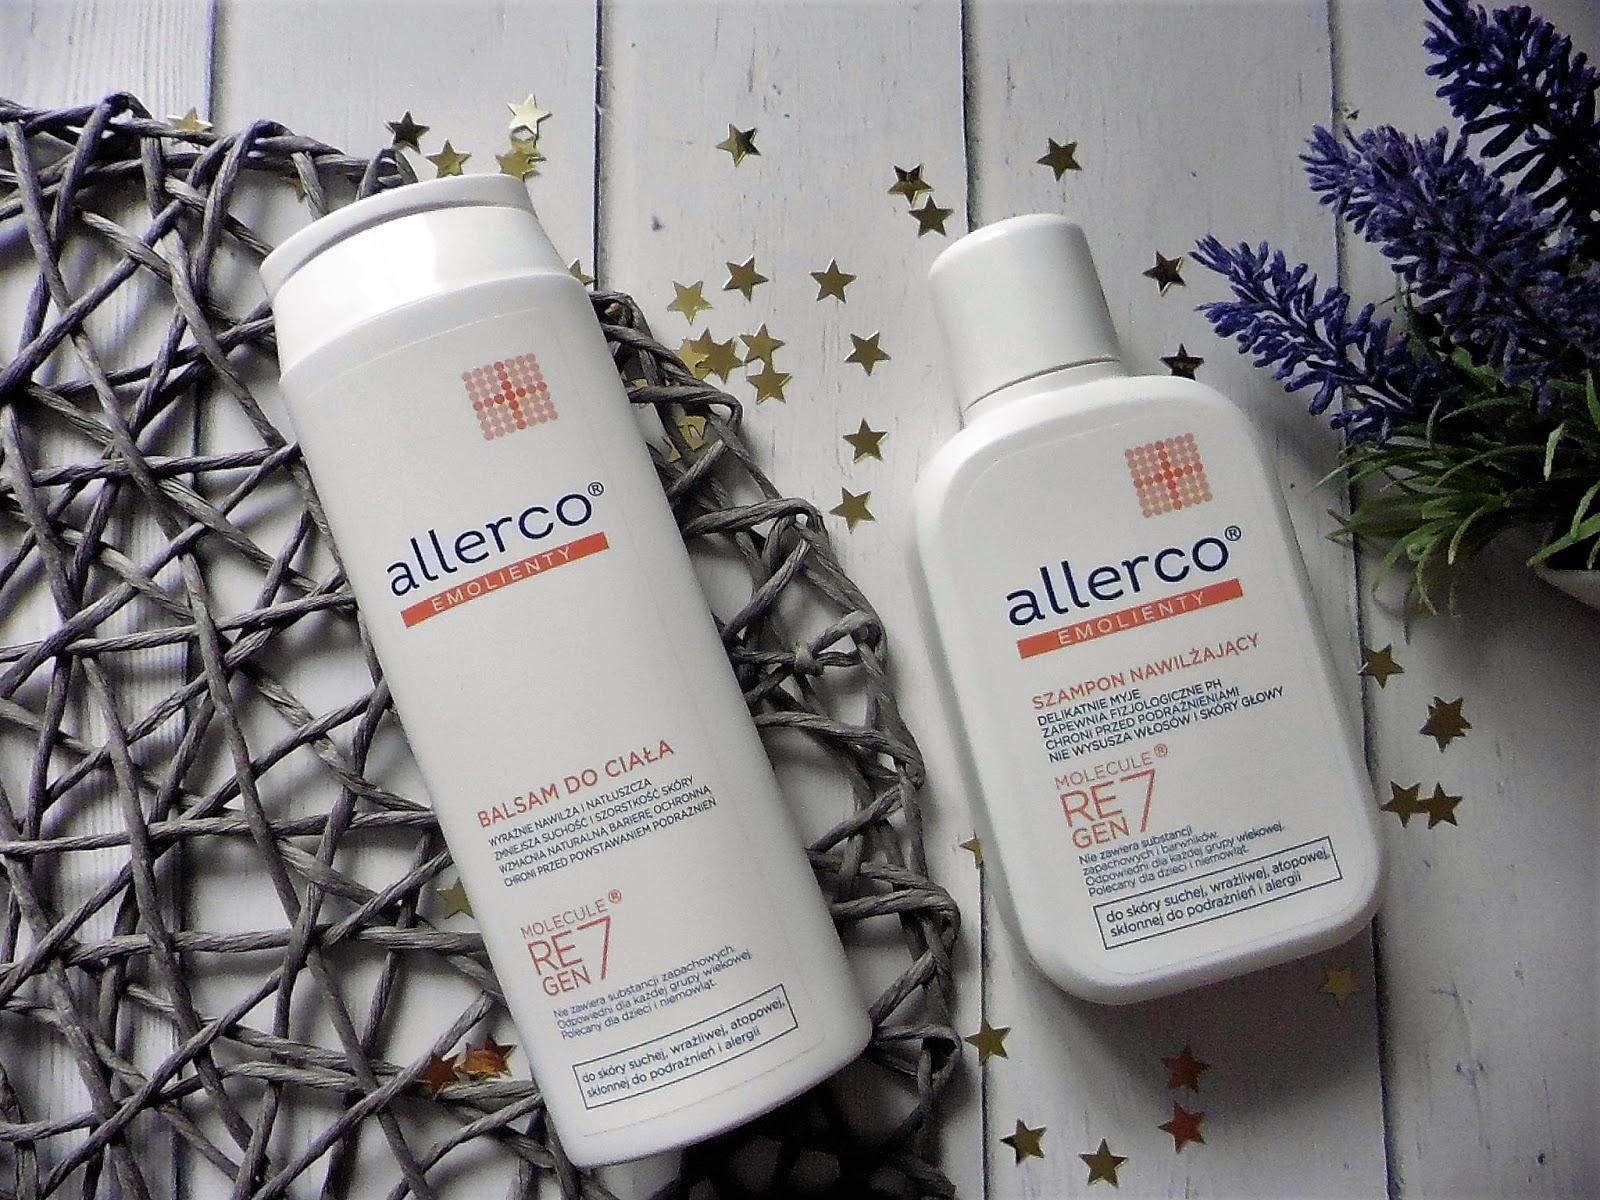 allerco-balsam-do-ciala, allerco-szampon-nawilzajacy, allerco-emolienty